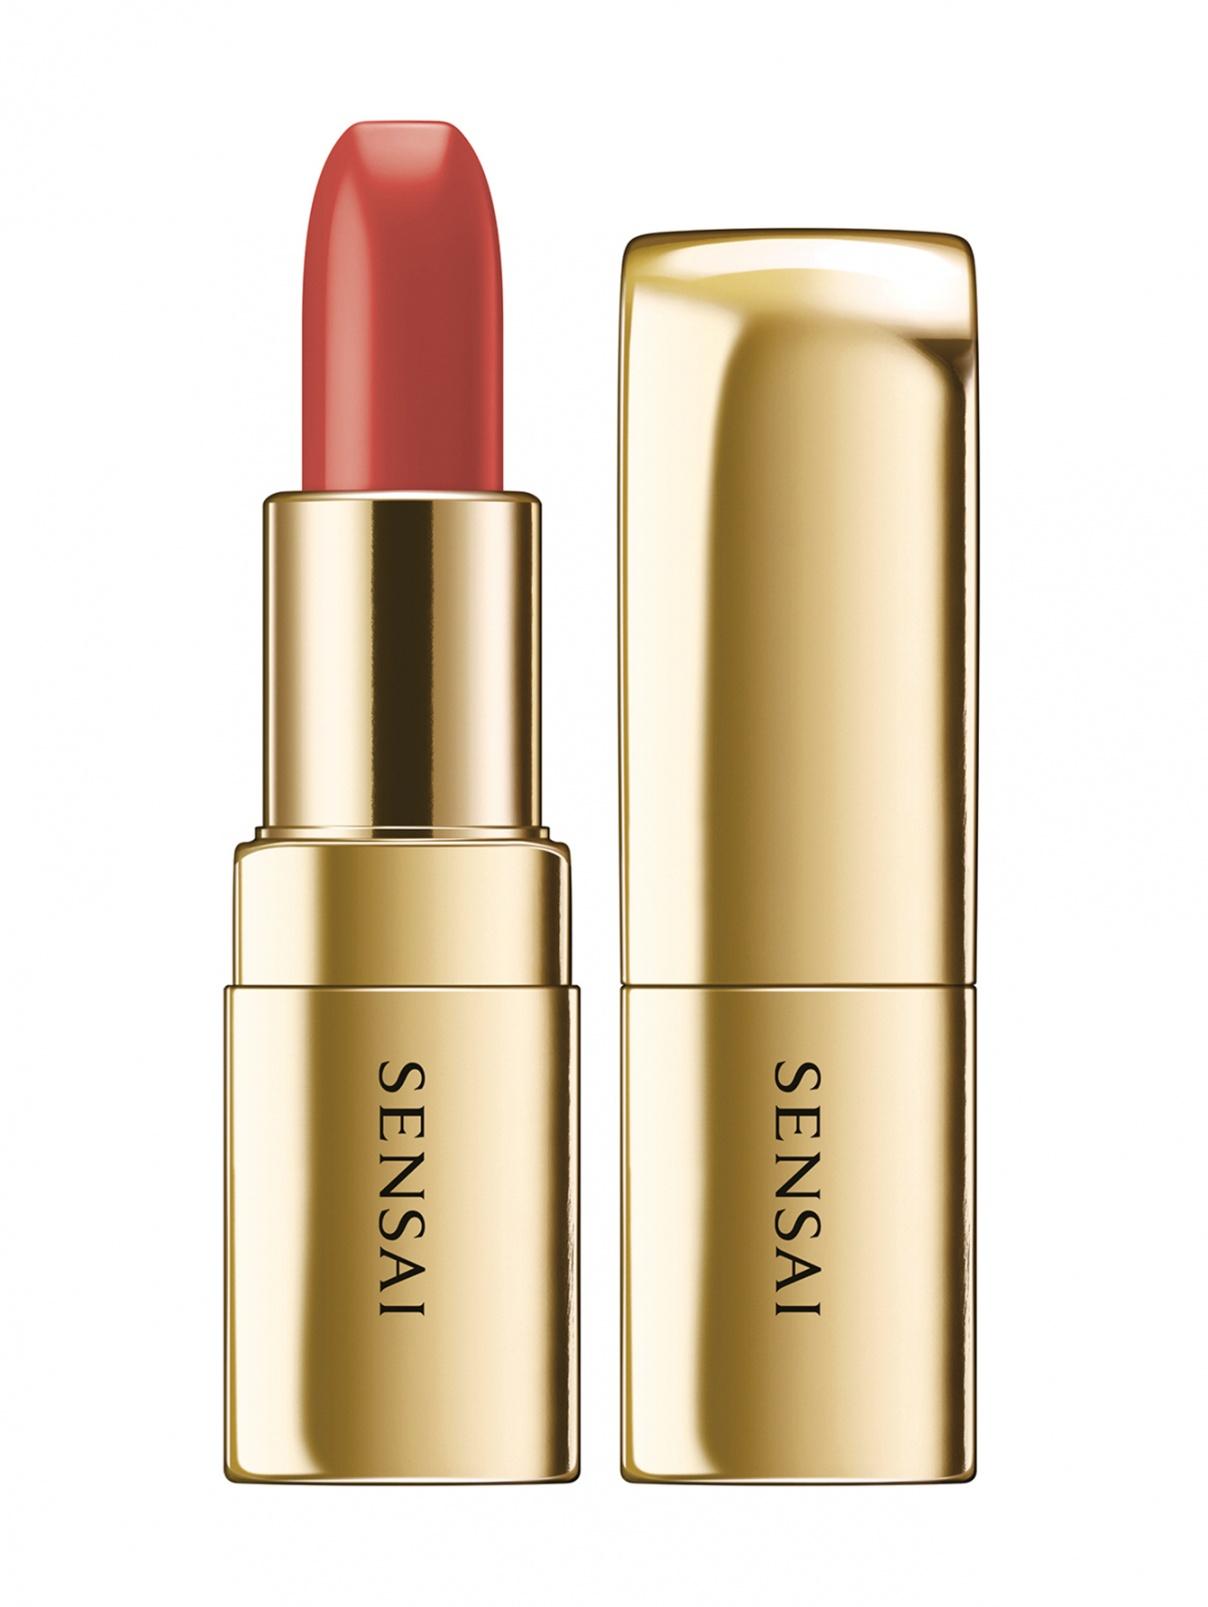 Помада The Lipstick оттенок - 13 SHIRAYURI NUDE Makeup Sensai  –  Общий вид